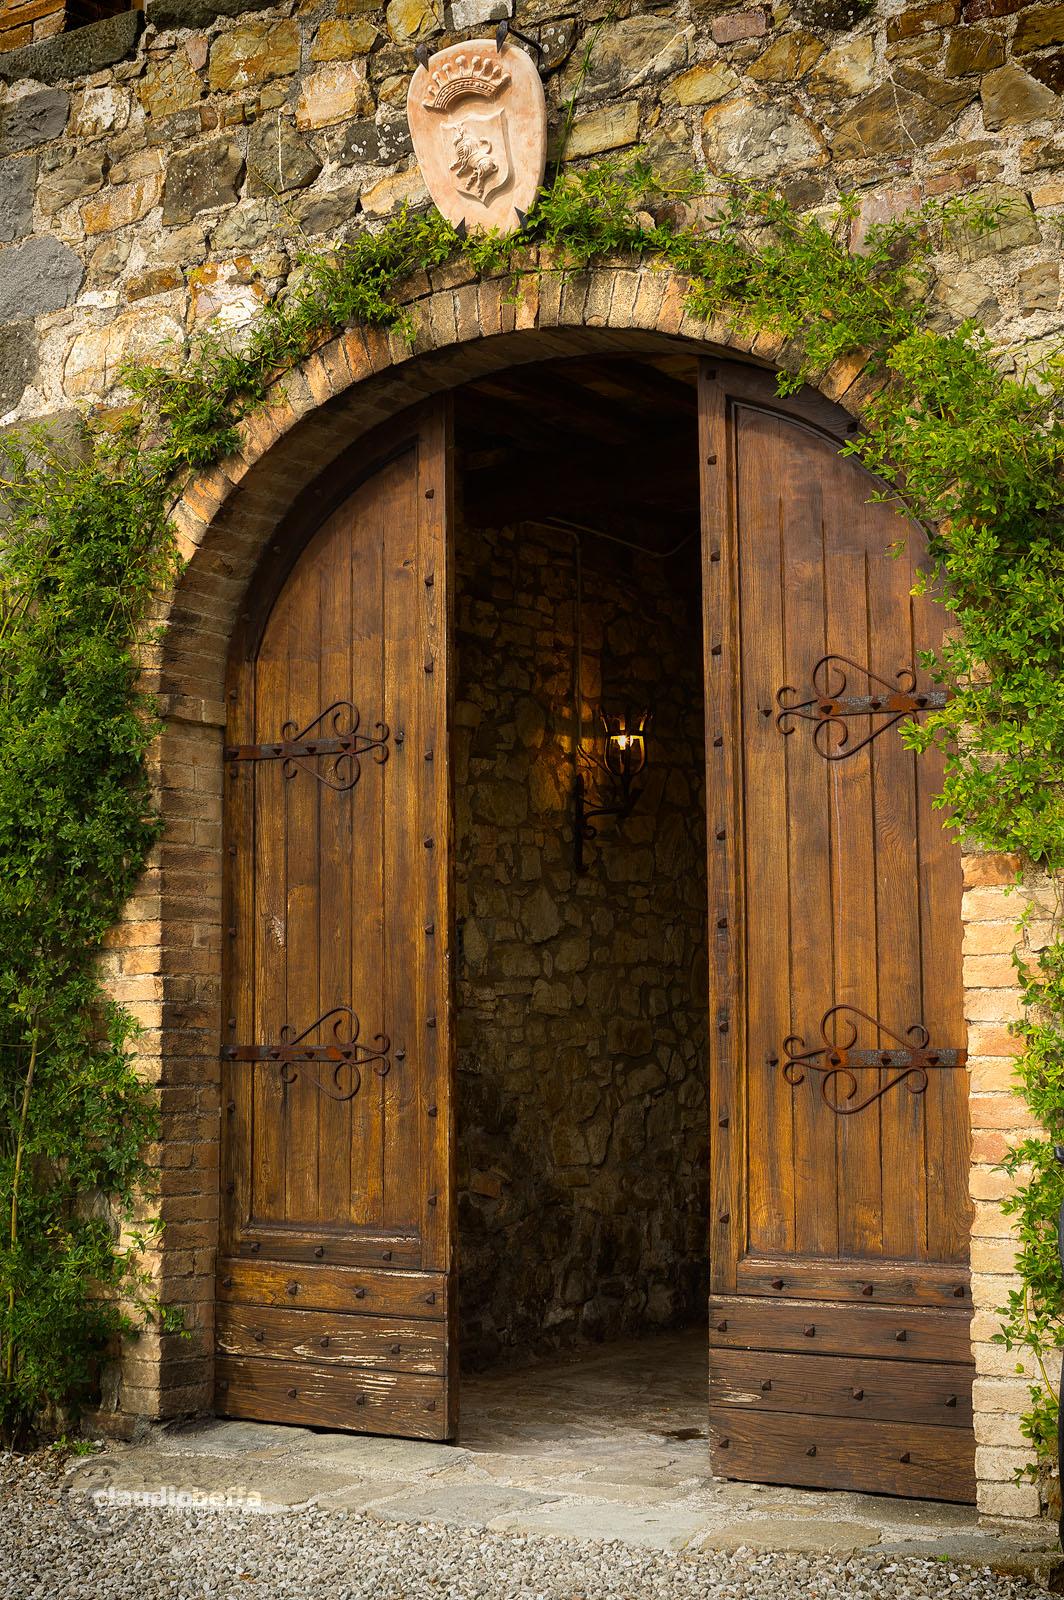 Farmhouse, Gate, Cellar, Wine, Wine-making, Costanti, Tuscany, Toscana, Val d'Orcia, Montalcino, Italy, Italia